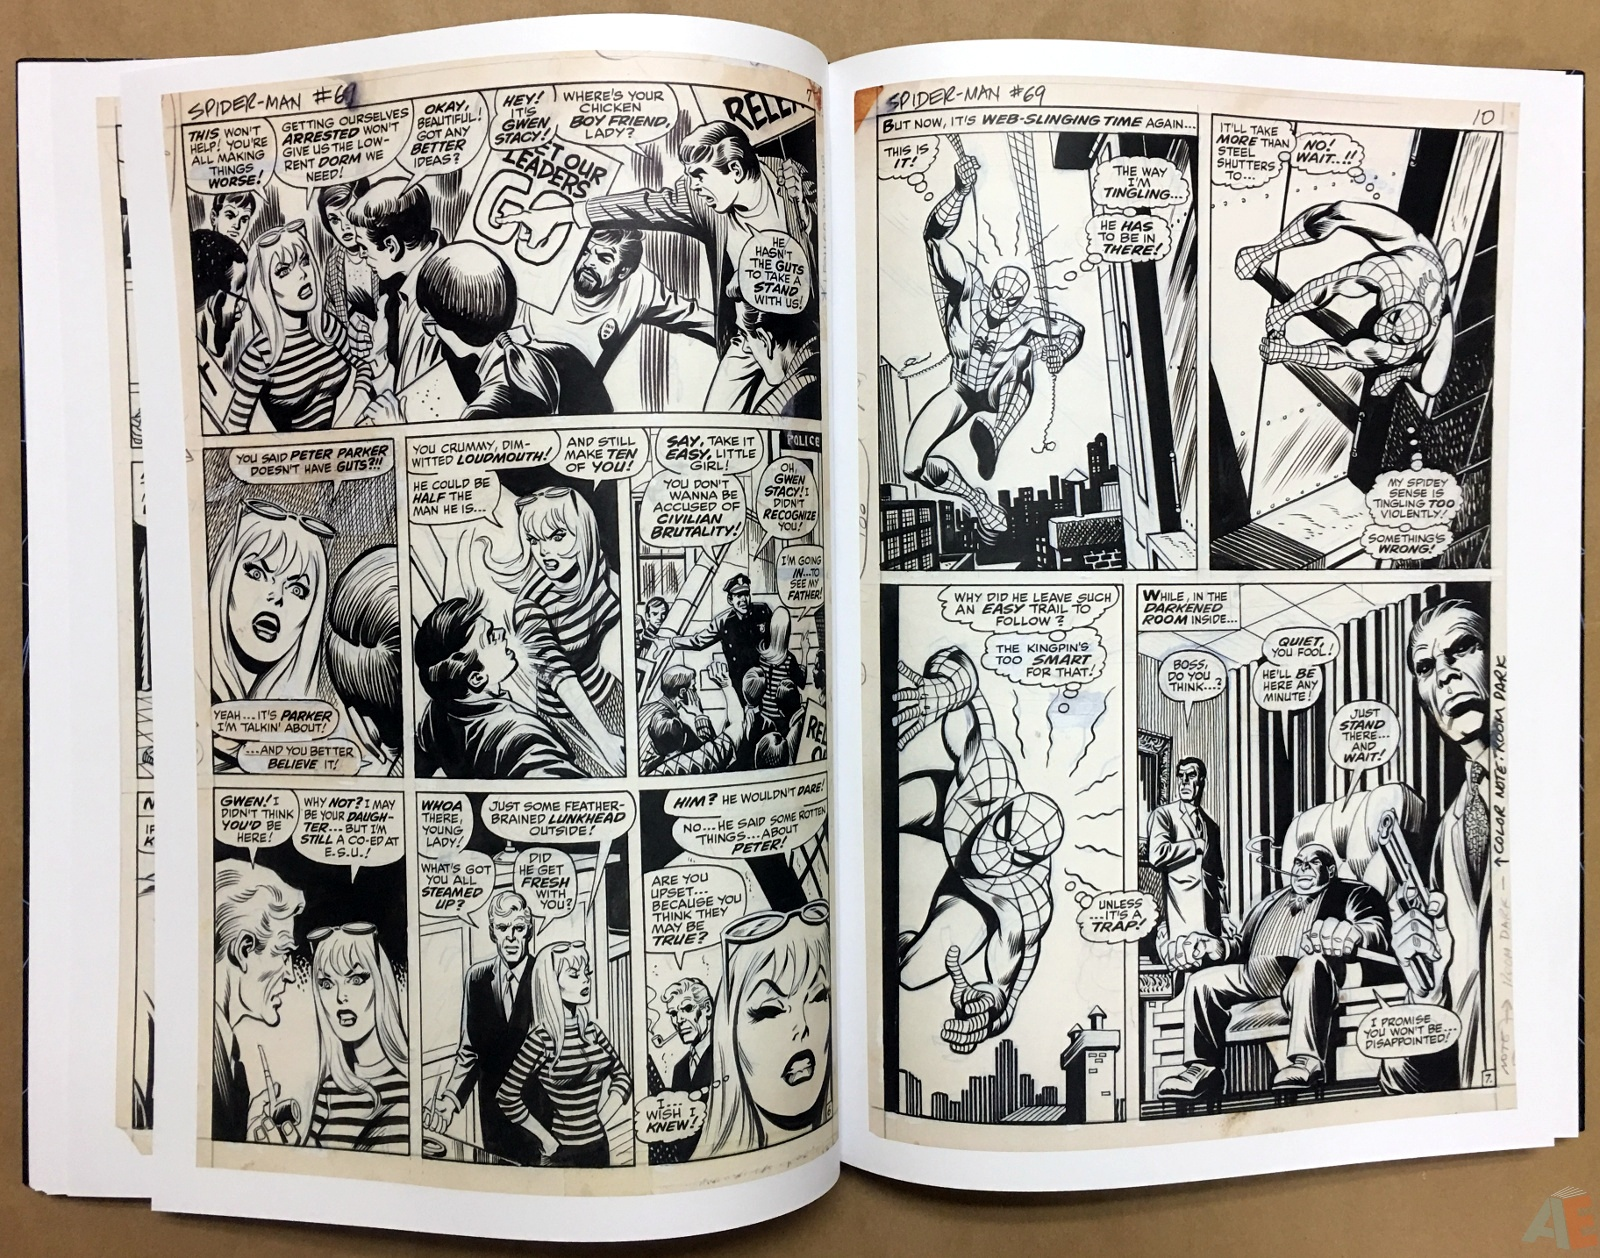 John Romita's The Amazing Spider-Man Artist's Edition 18